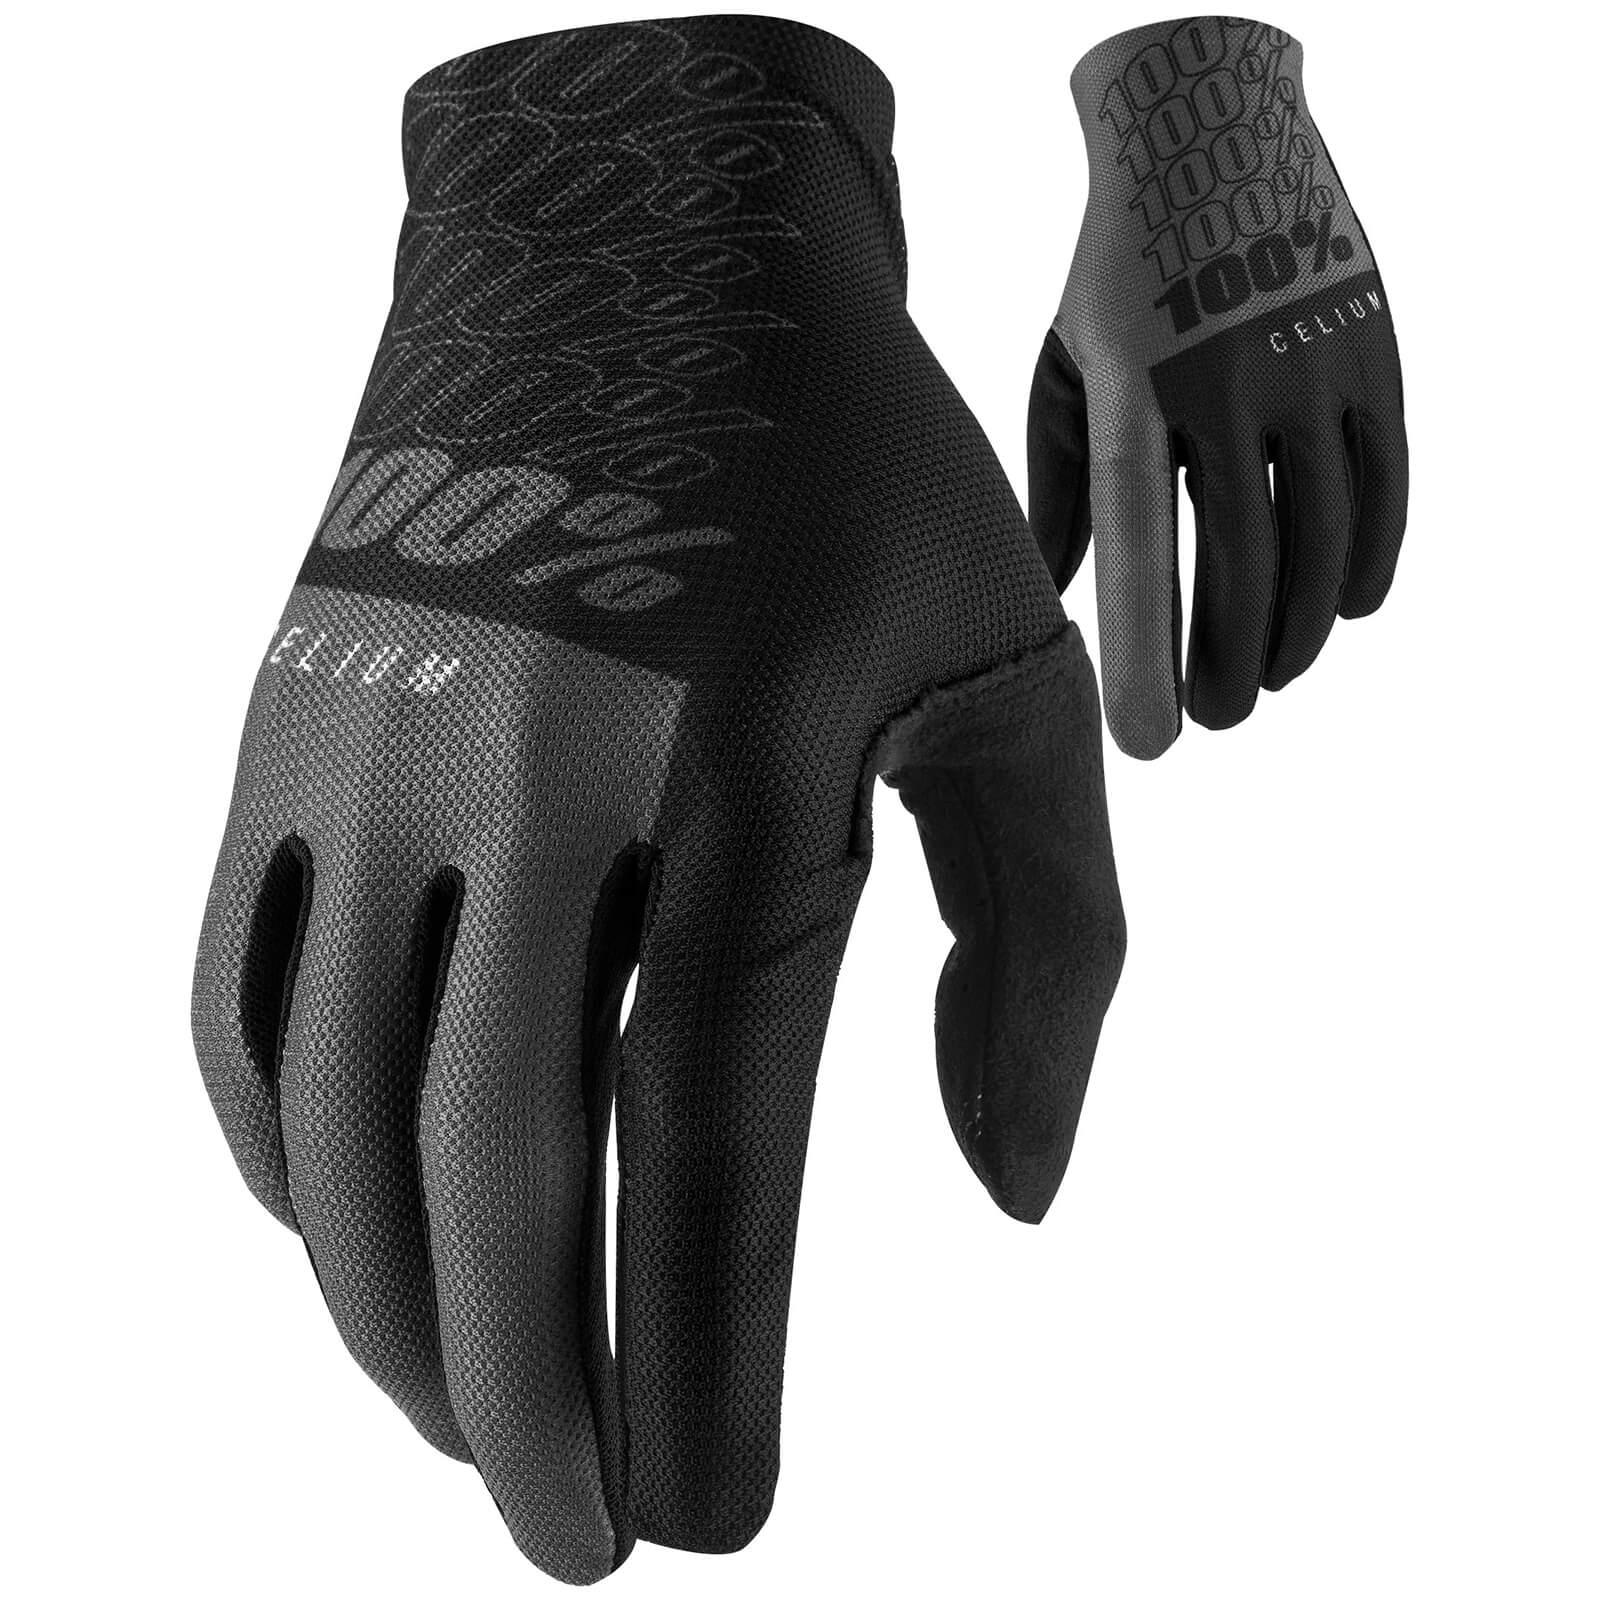 Image of 100% Celium MTB Gloves - M - Black/Grey